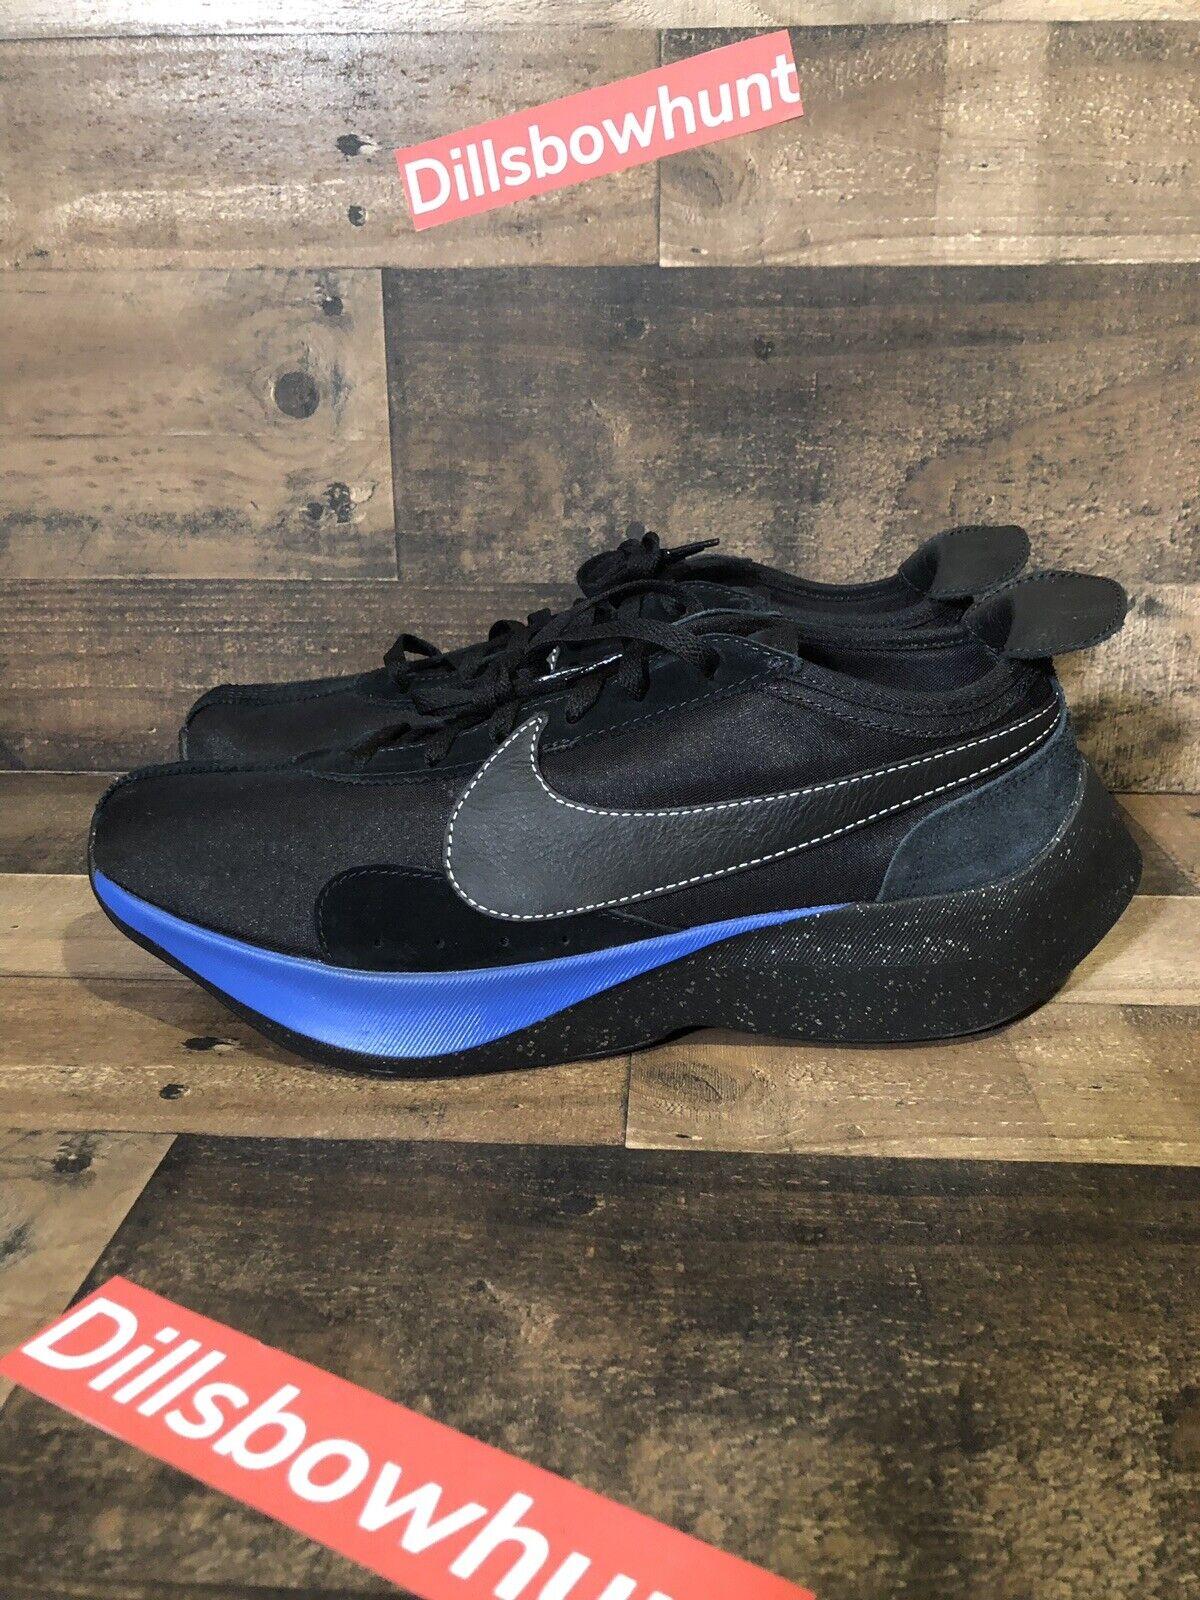 purchase cheap 59376 d049e Nike Moon Moon Moon Racer QS bluee Black Men Running Casual shoes Sneakers  BV7779-001